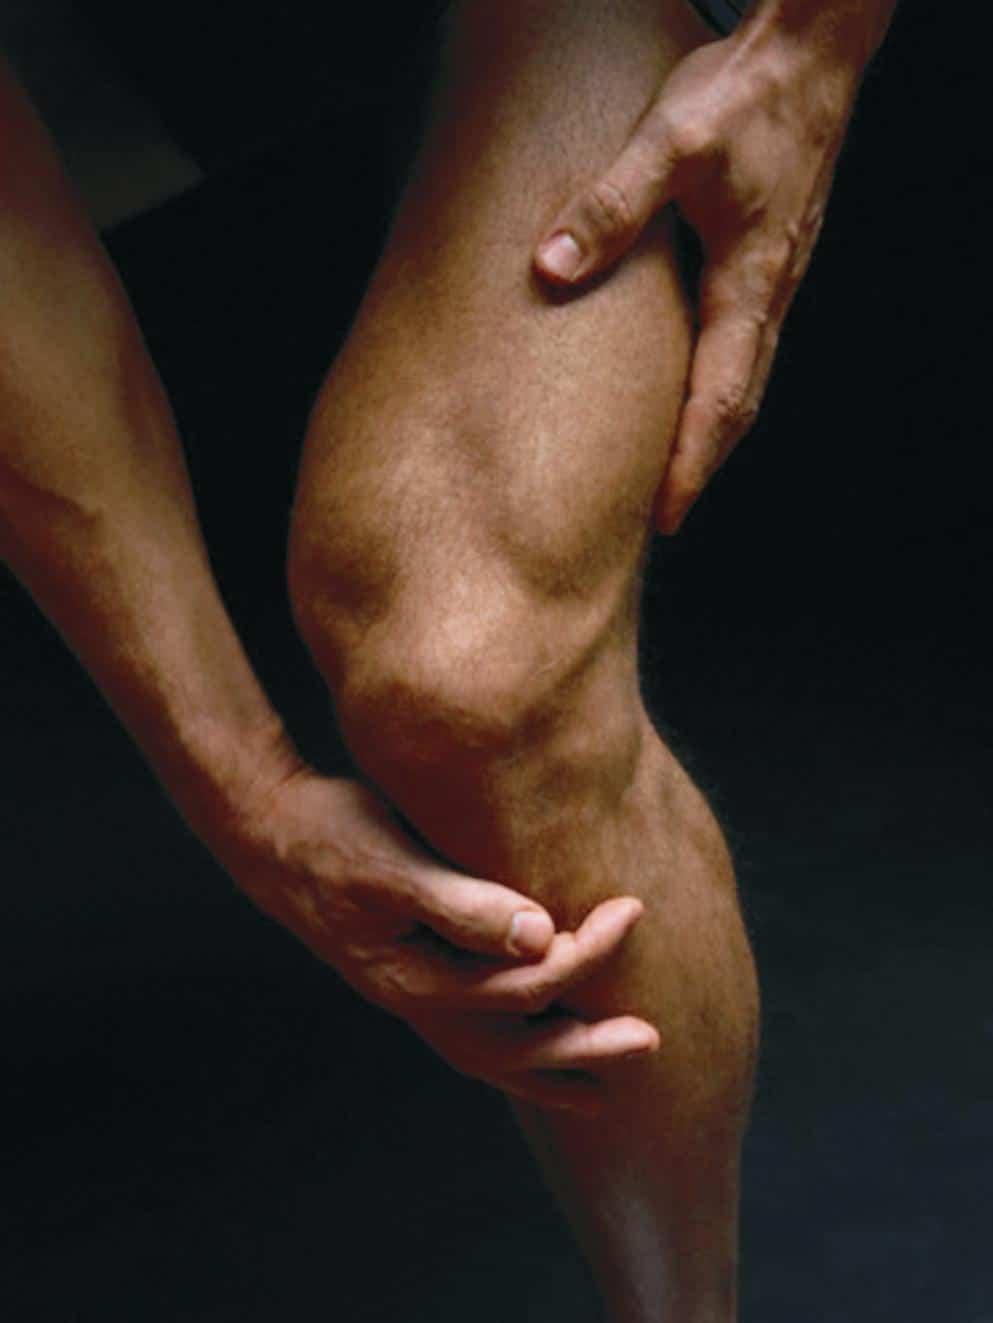 Biking to Manage Arthritis